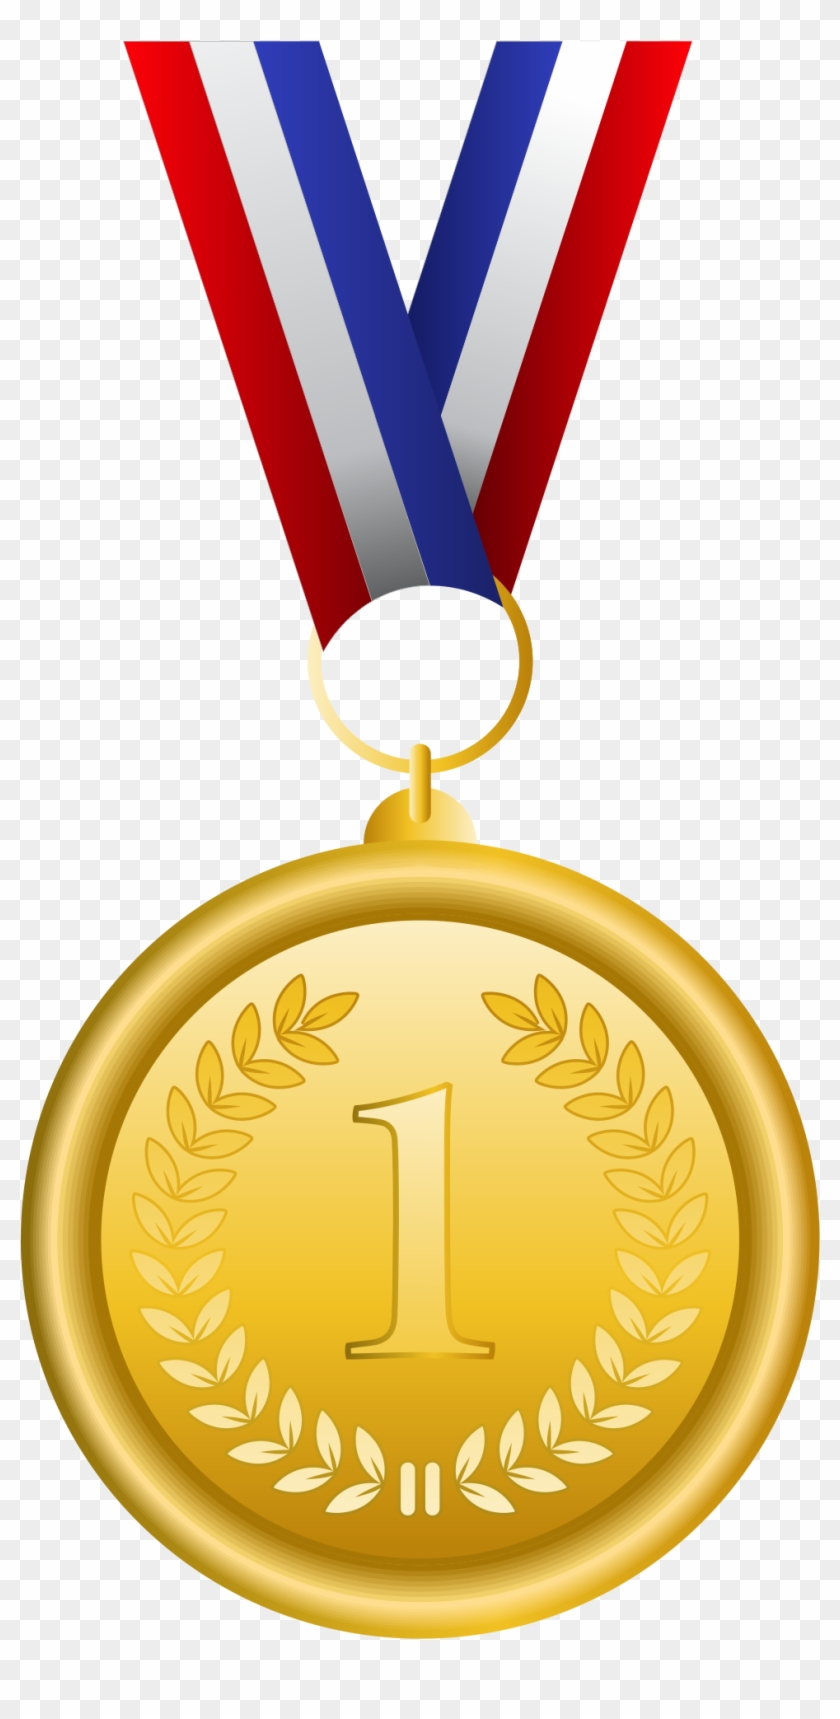 First place medal clipart svg freeuse Gold Medal Olympic Medal Bronze Medal Clip Art - First Place Medal ... svg freeuse